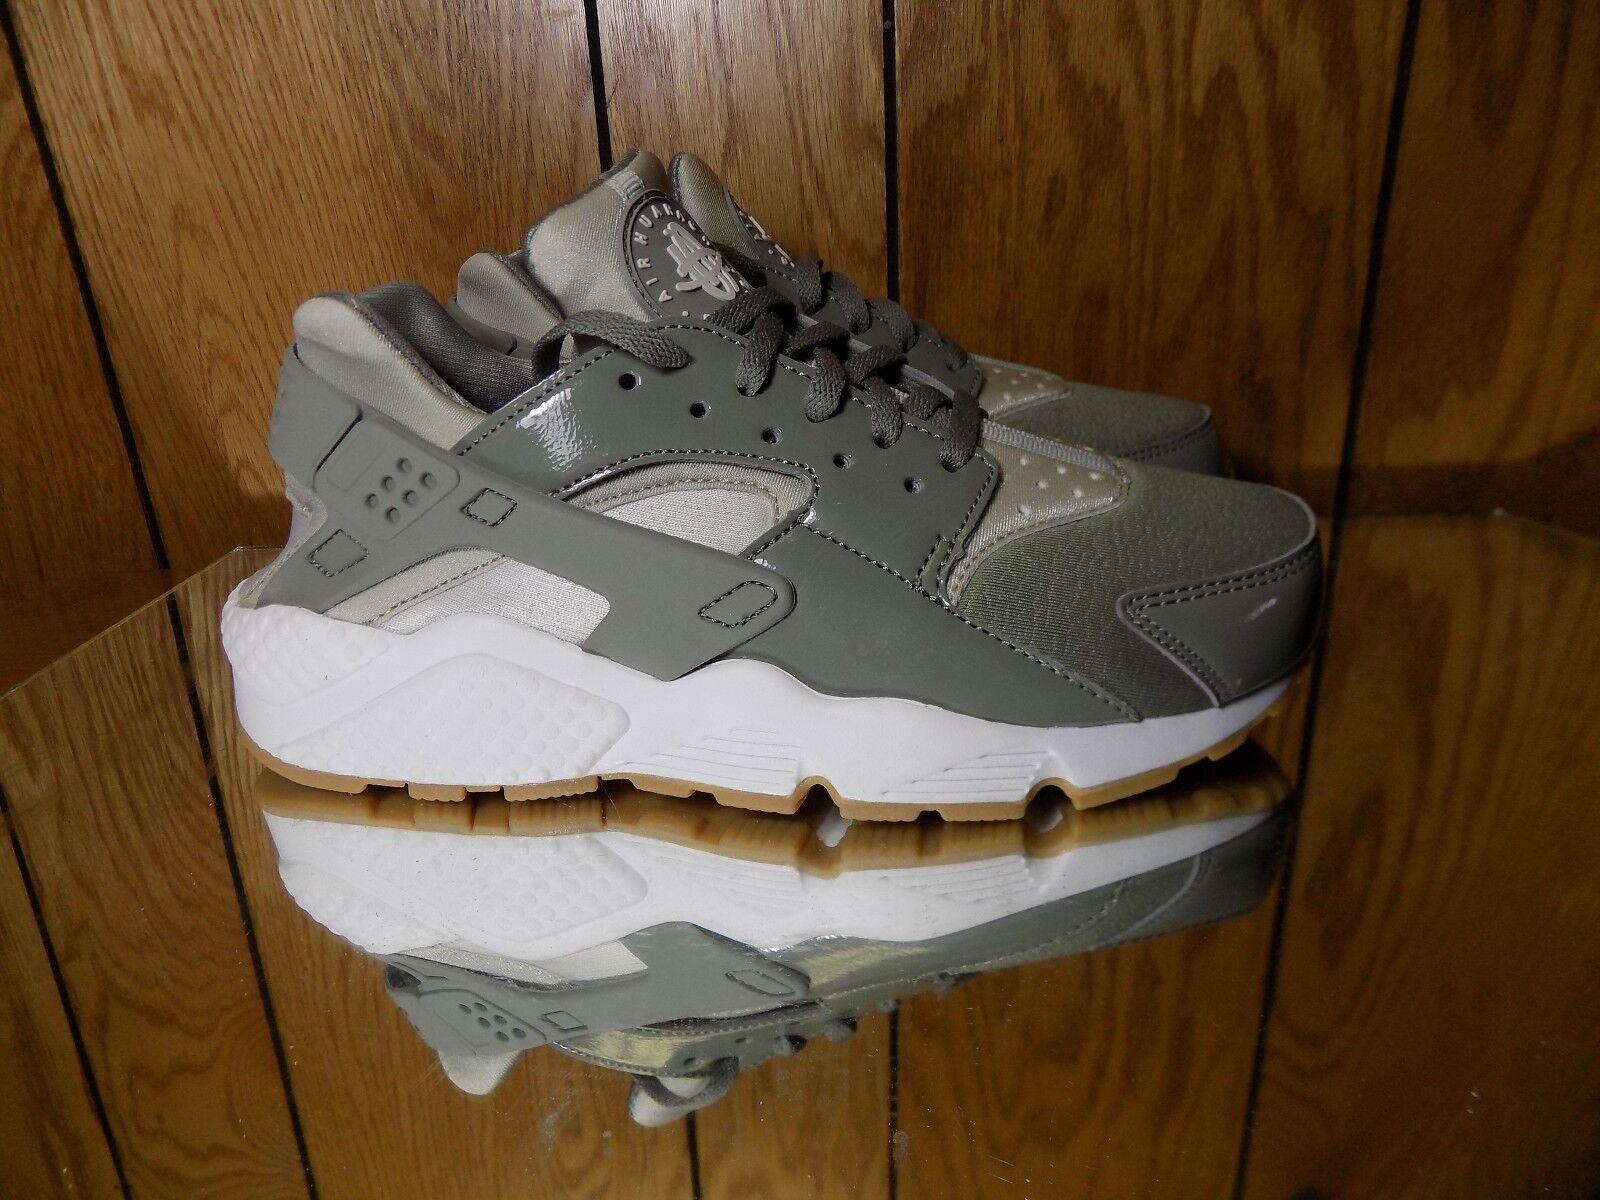 d05b3d0b6287 Nike Nike Nike Women s AIR HUARACHE RUN shoes Dark Stucco Pale Grey 634835-027  b s. 7.5 c329f1